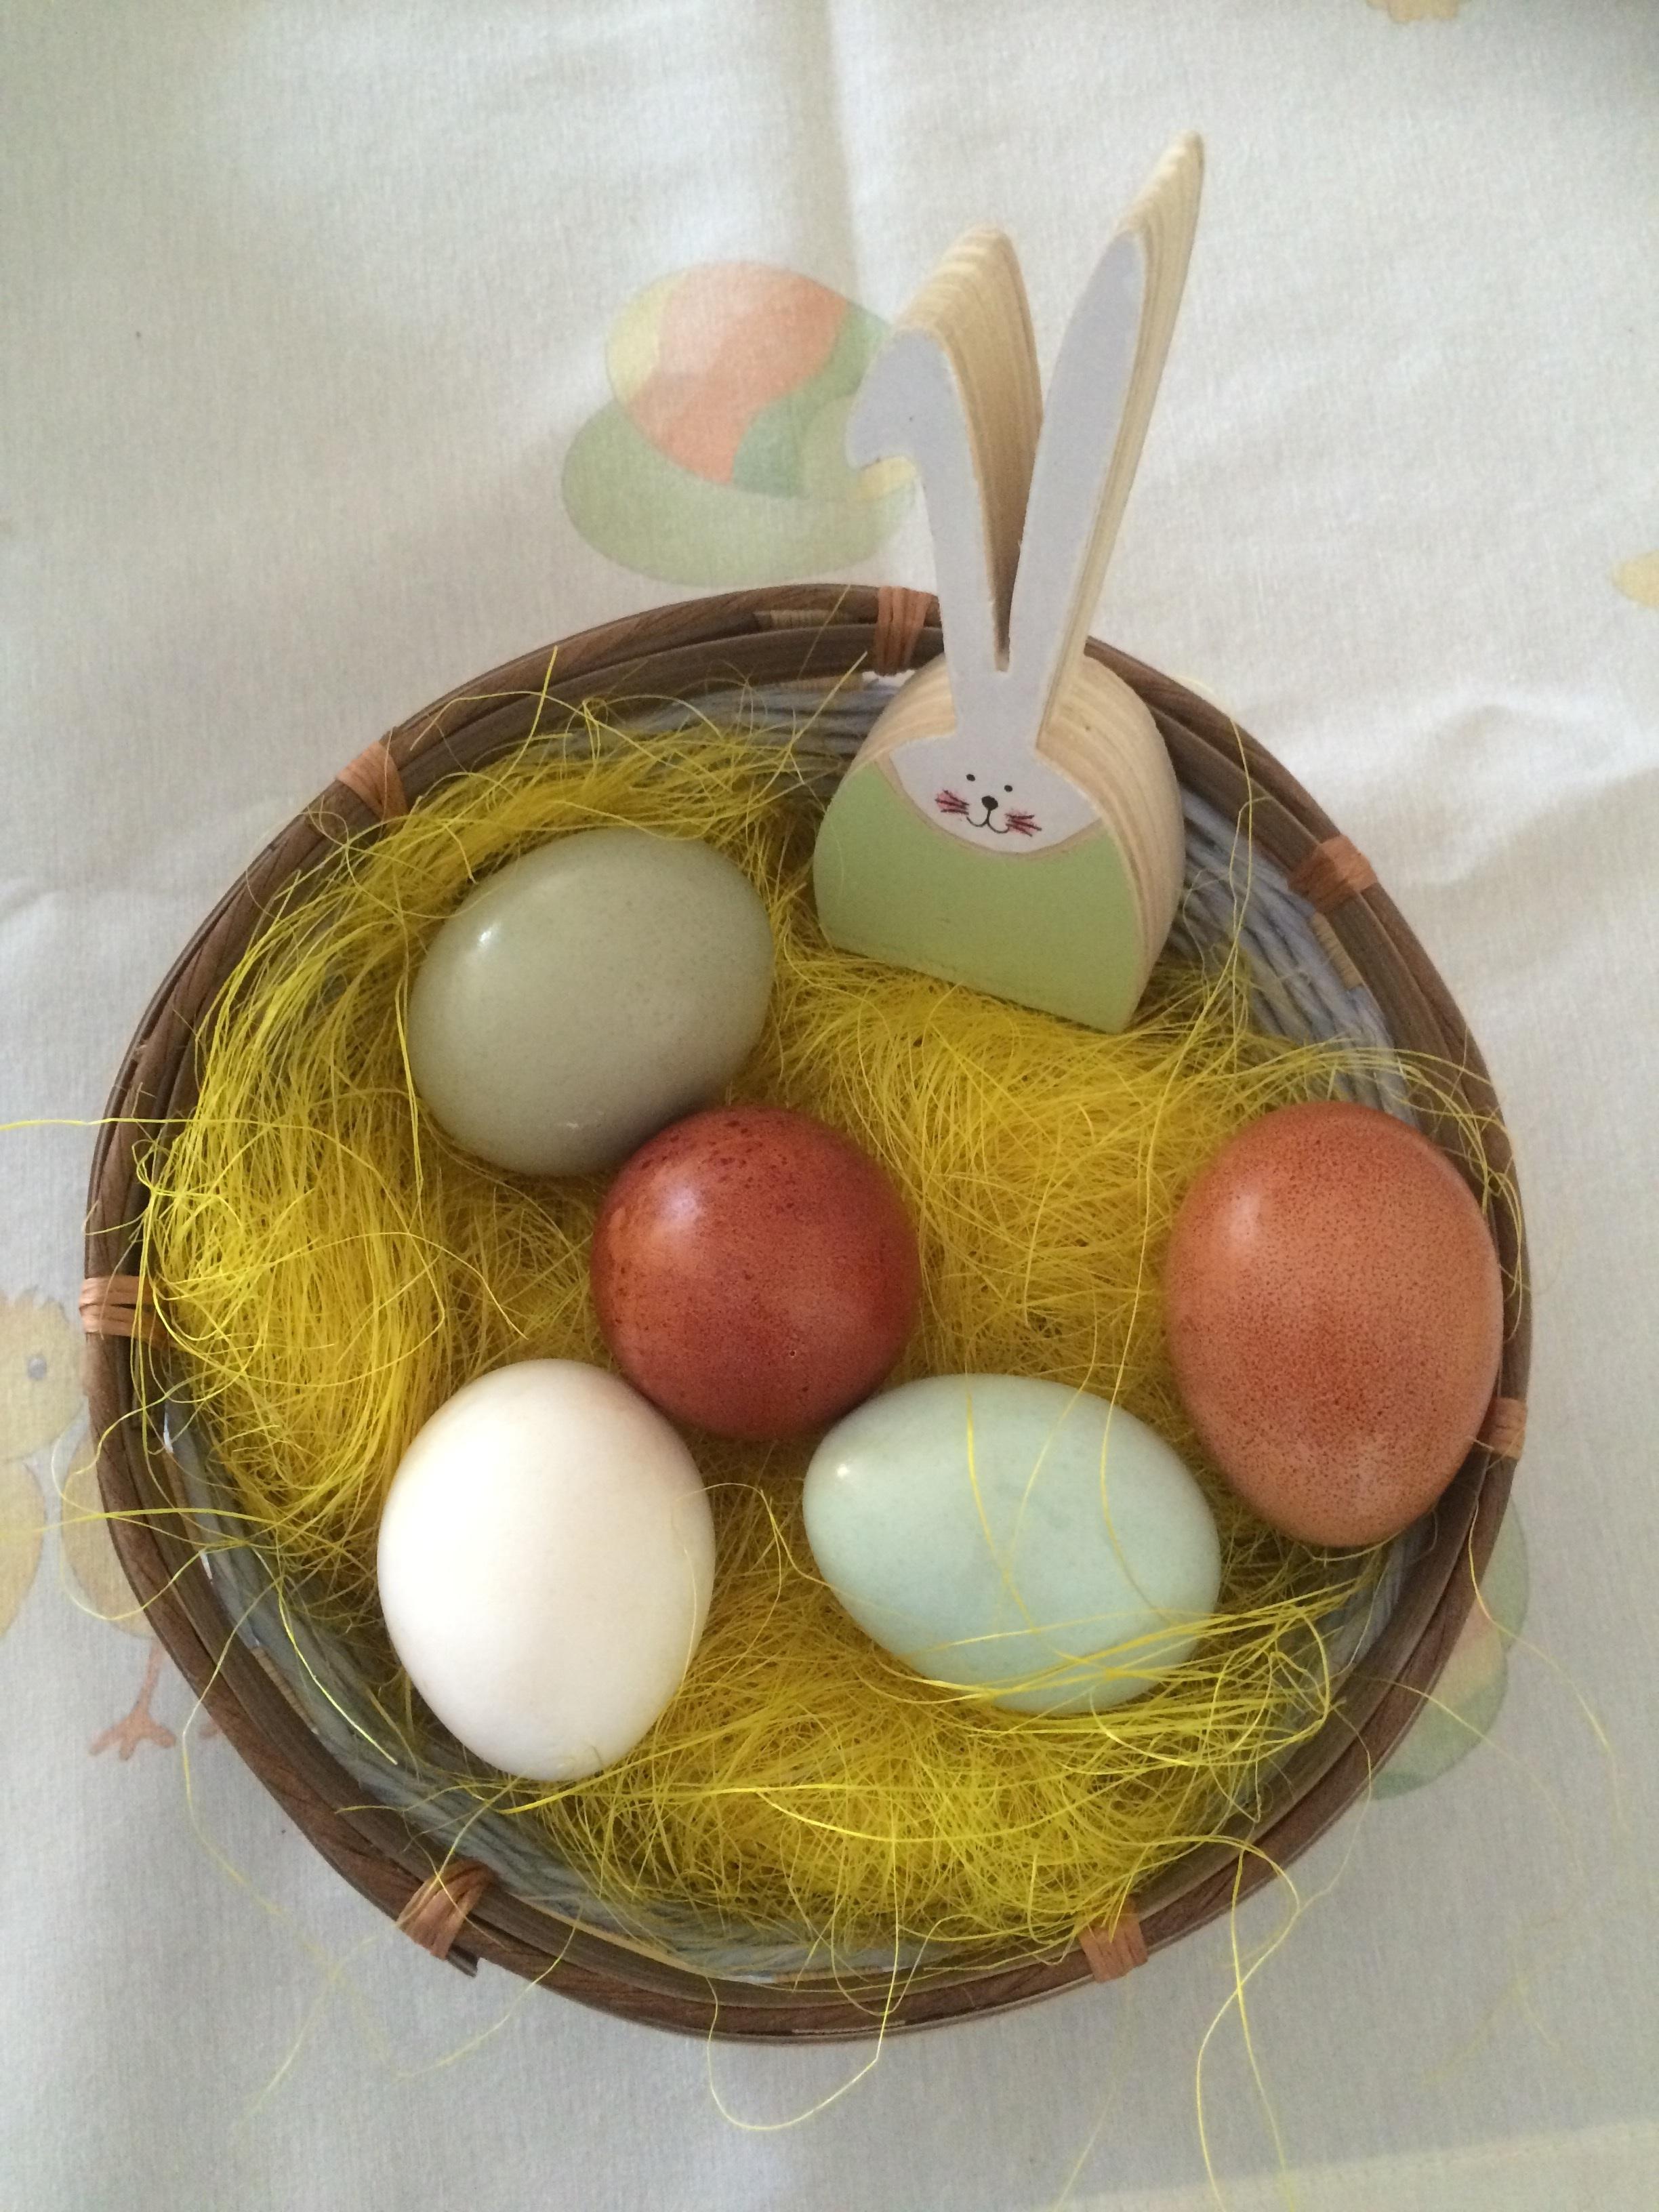 Kostenlose foto : Lebensmittel, Hase, Ei, Osterei, Ostern nest, Eier ...